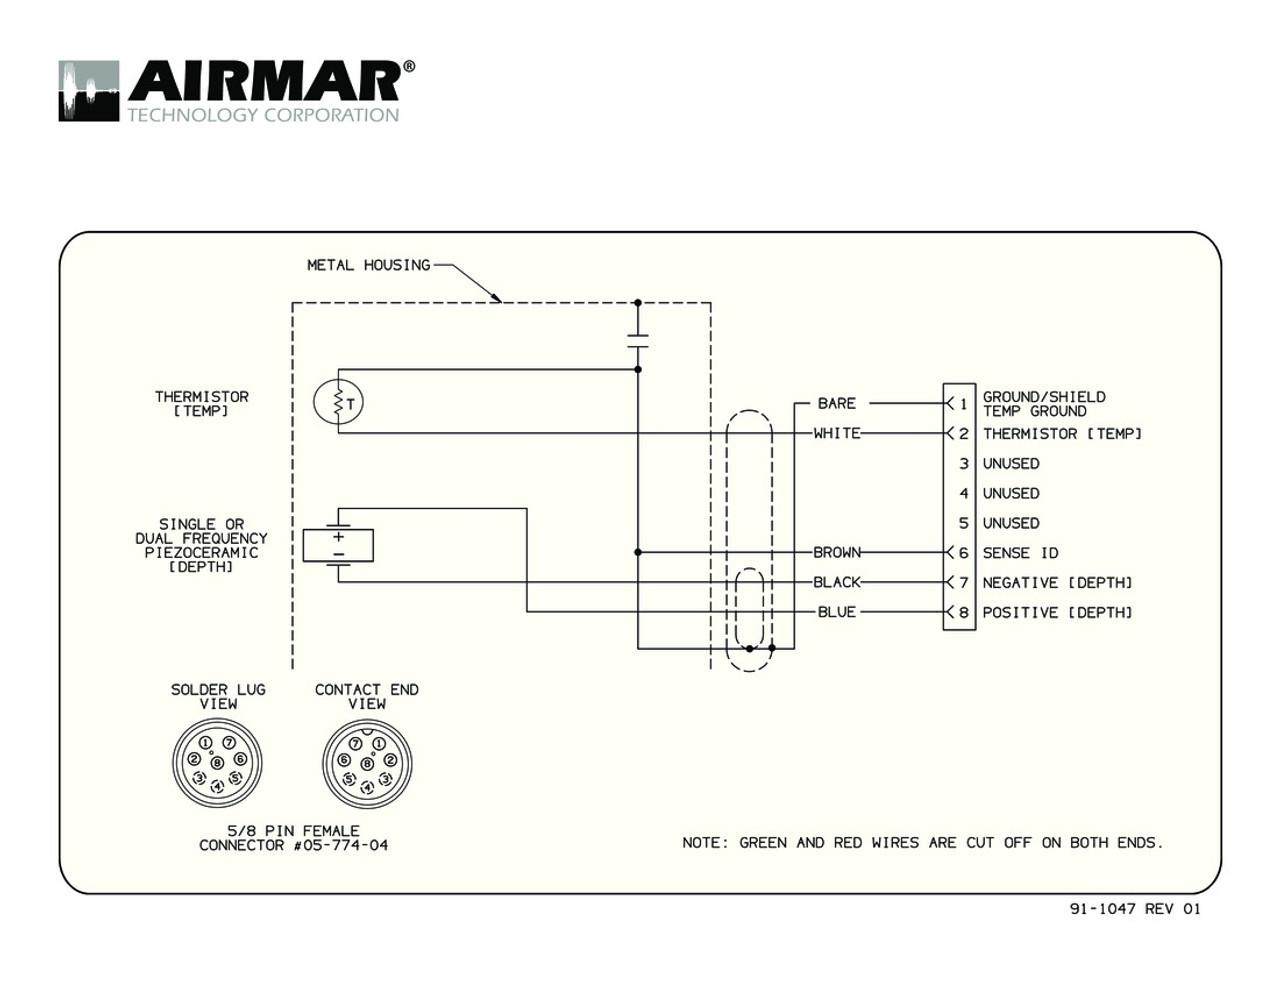 medium resolution of garmin radar wiring diagram wiring librarydepth u0026 temperature b117 transducers with garmin 8 pin connector